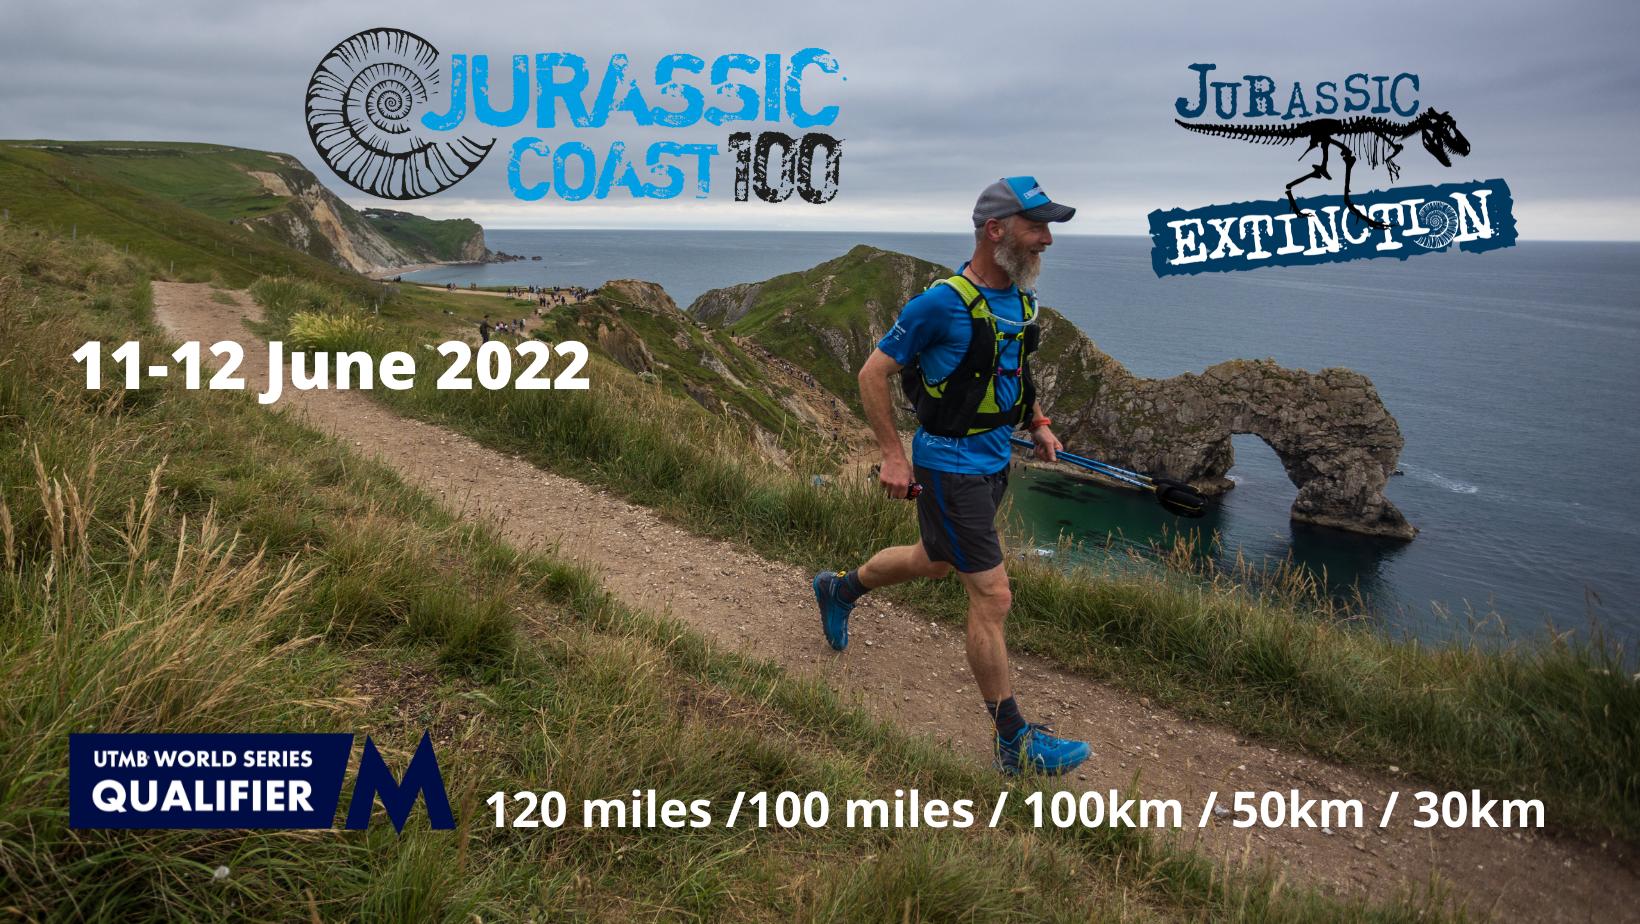 Jurassic Coast 100 Challenge Events